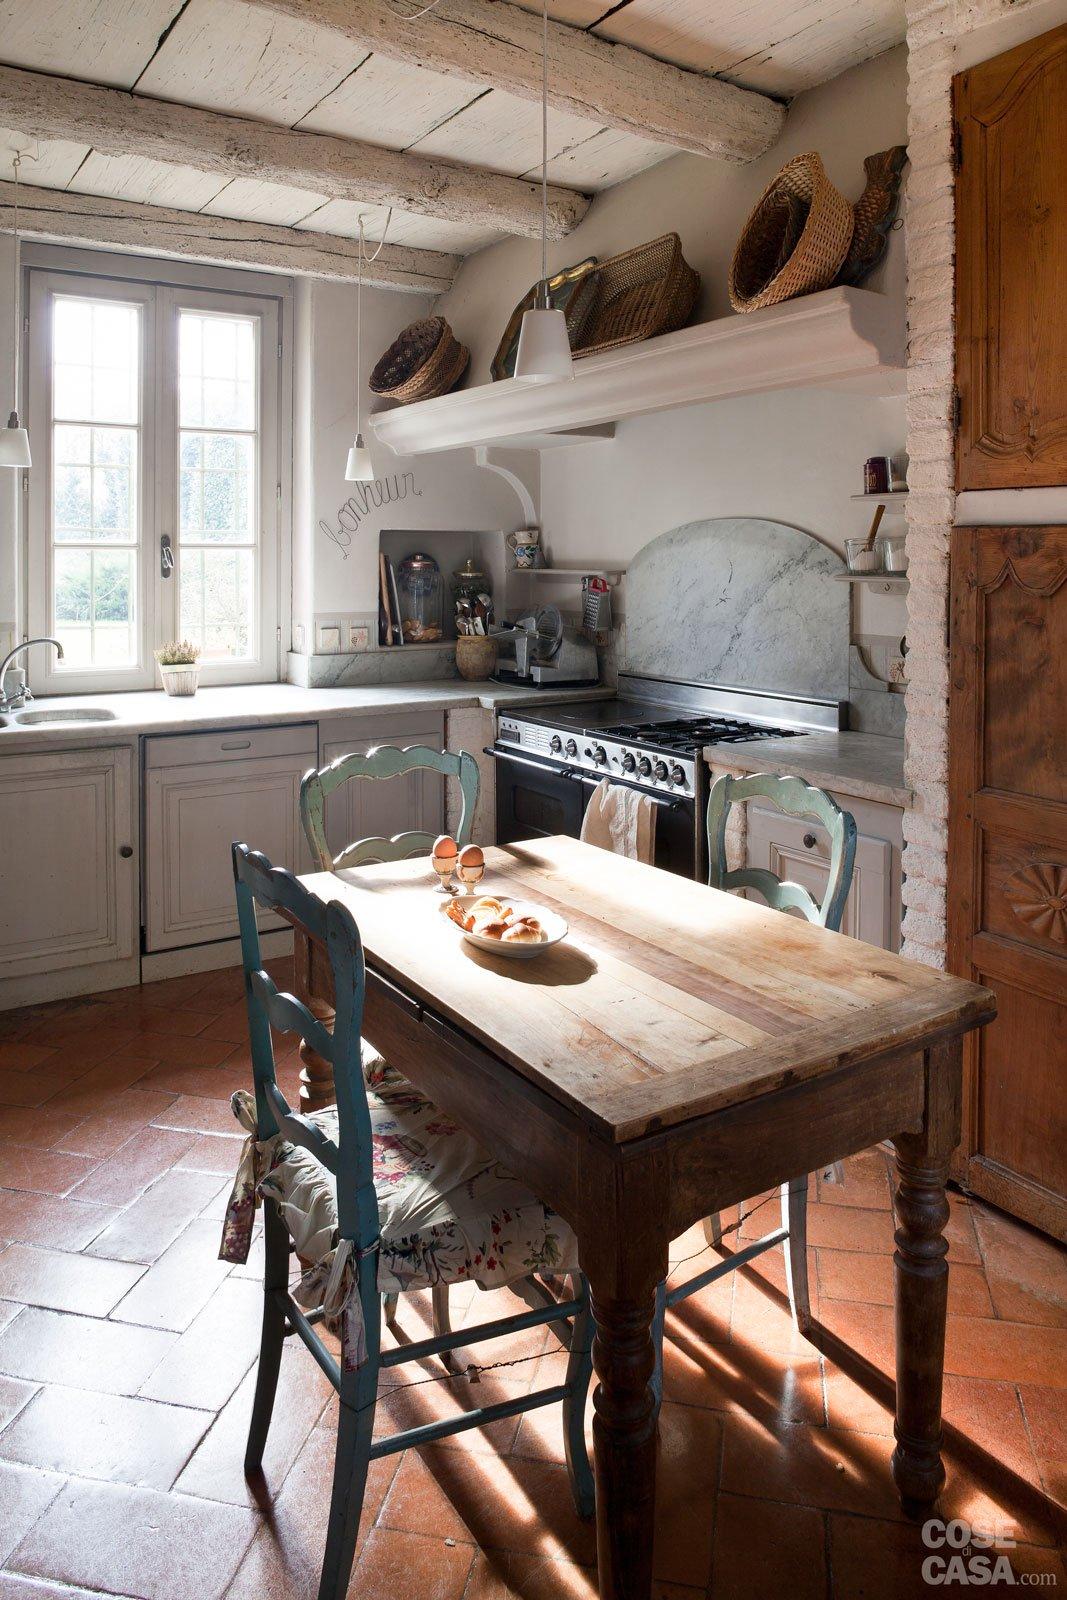 Da cascina a casa chic con travi a vista e soffitti spioventi - Cose di Casa